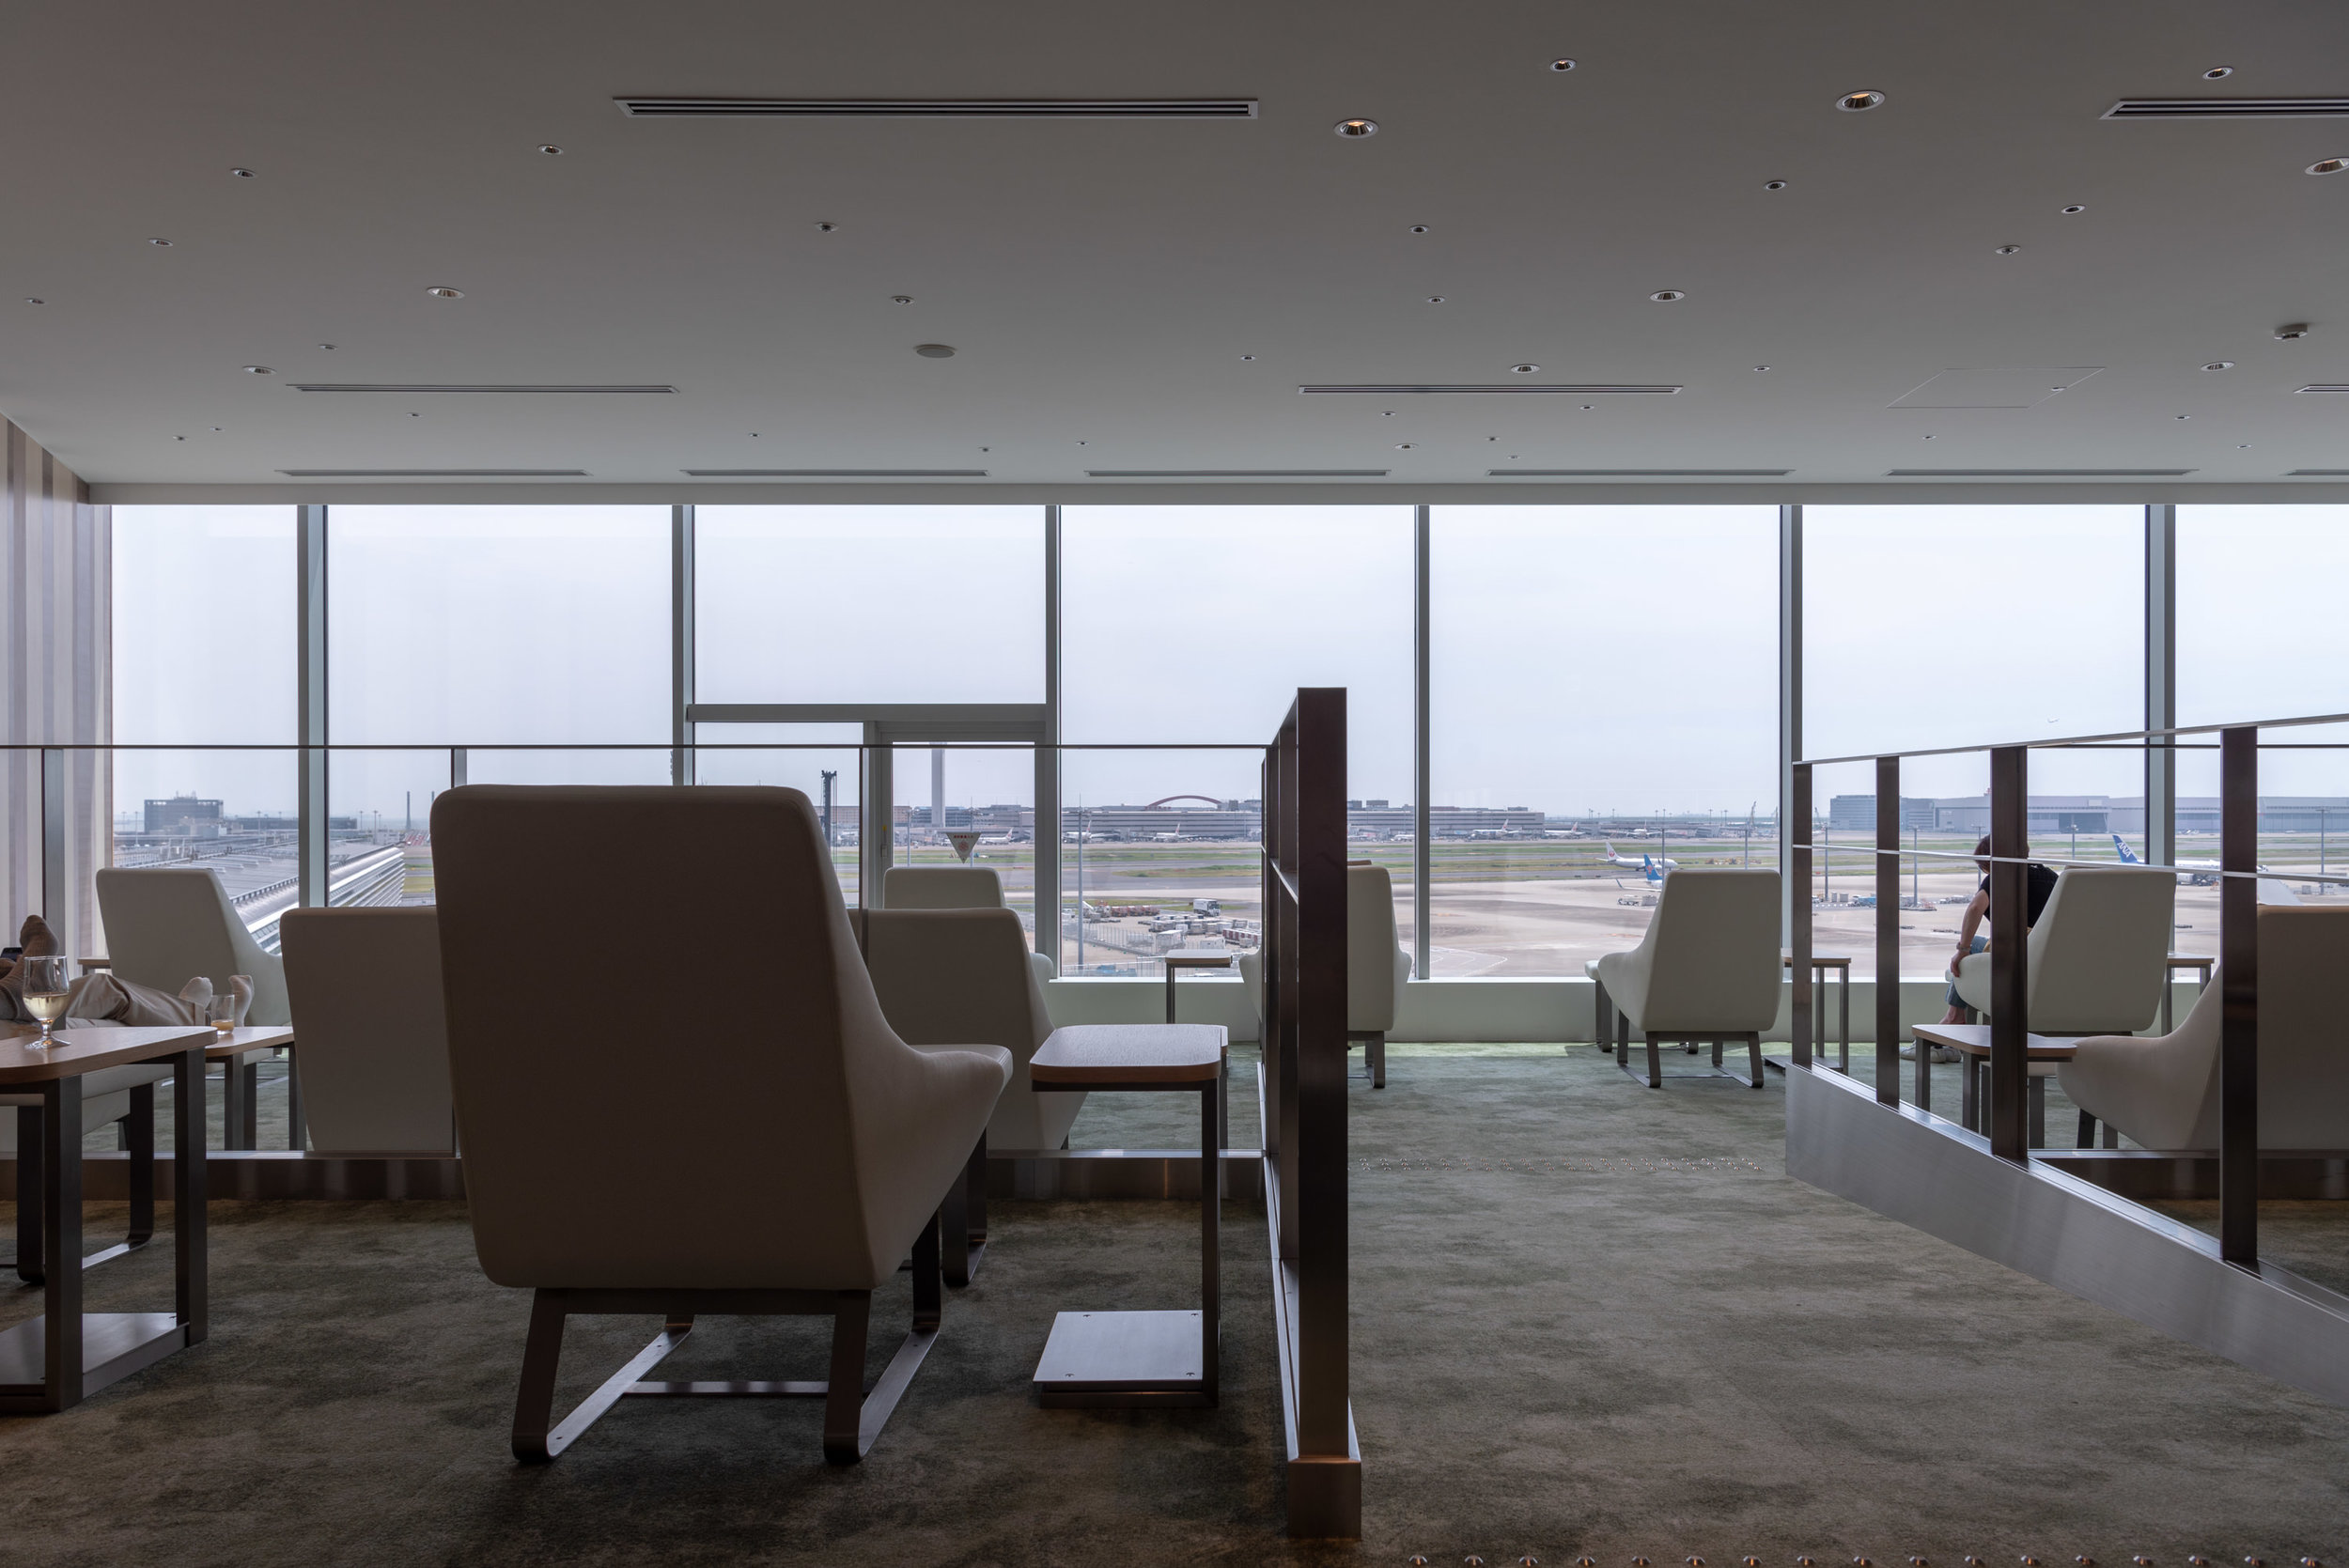 Skyview Lounge  Japan Airlines Sakura Lounge Skyview - Haneda Airport (HND)